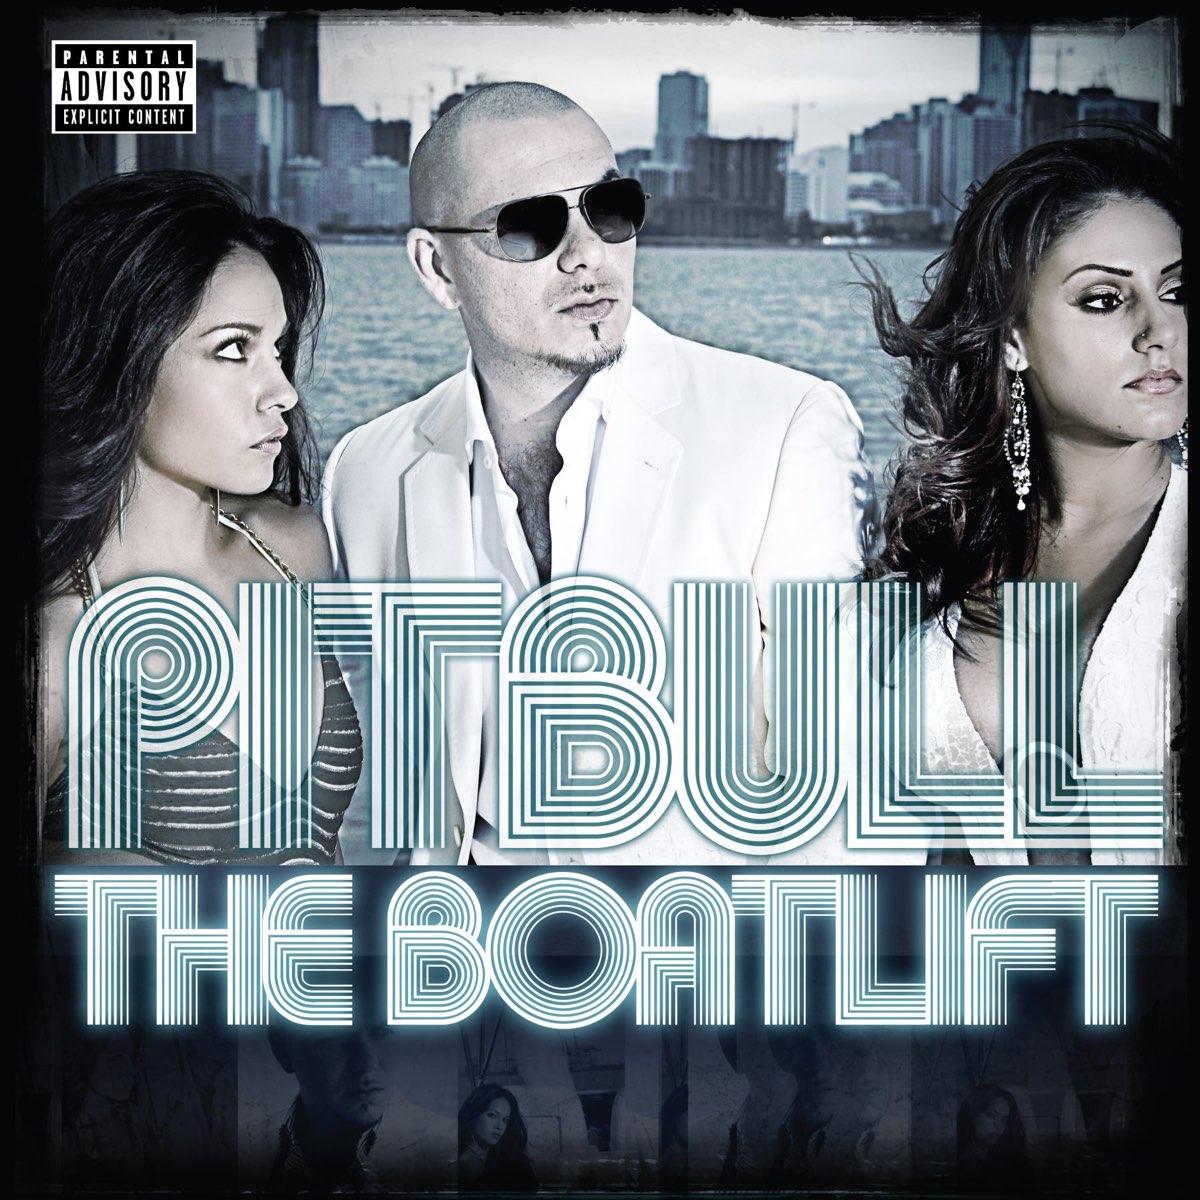 Pitbull, The Boatlift